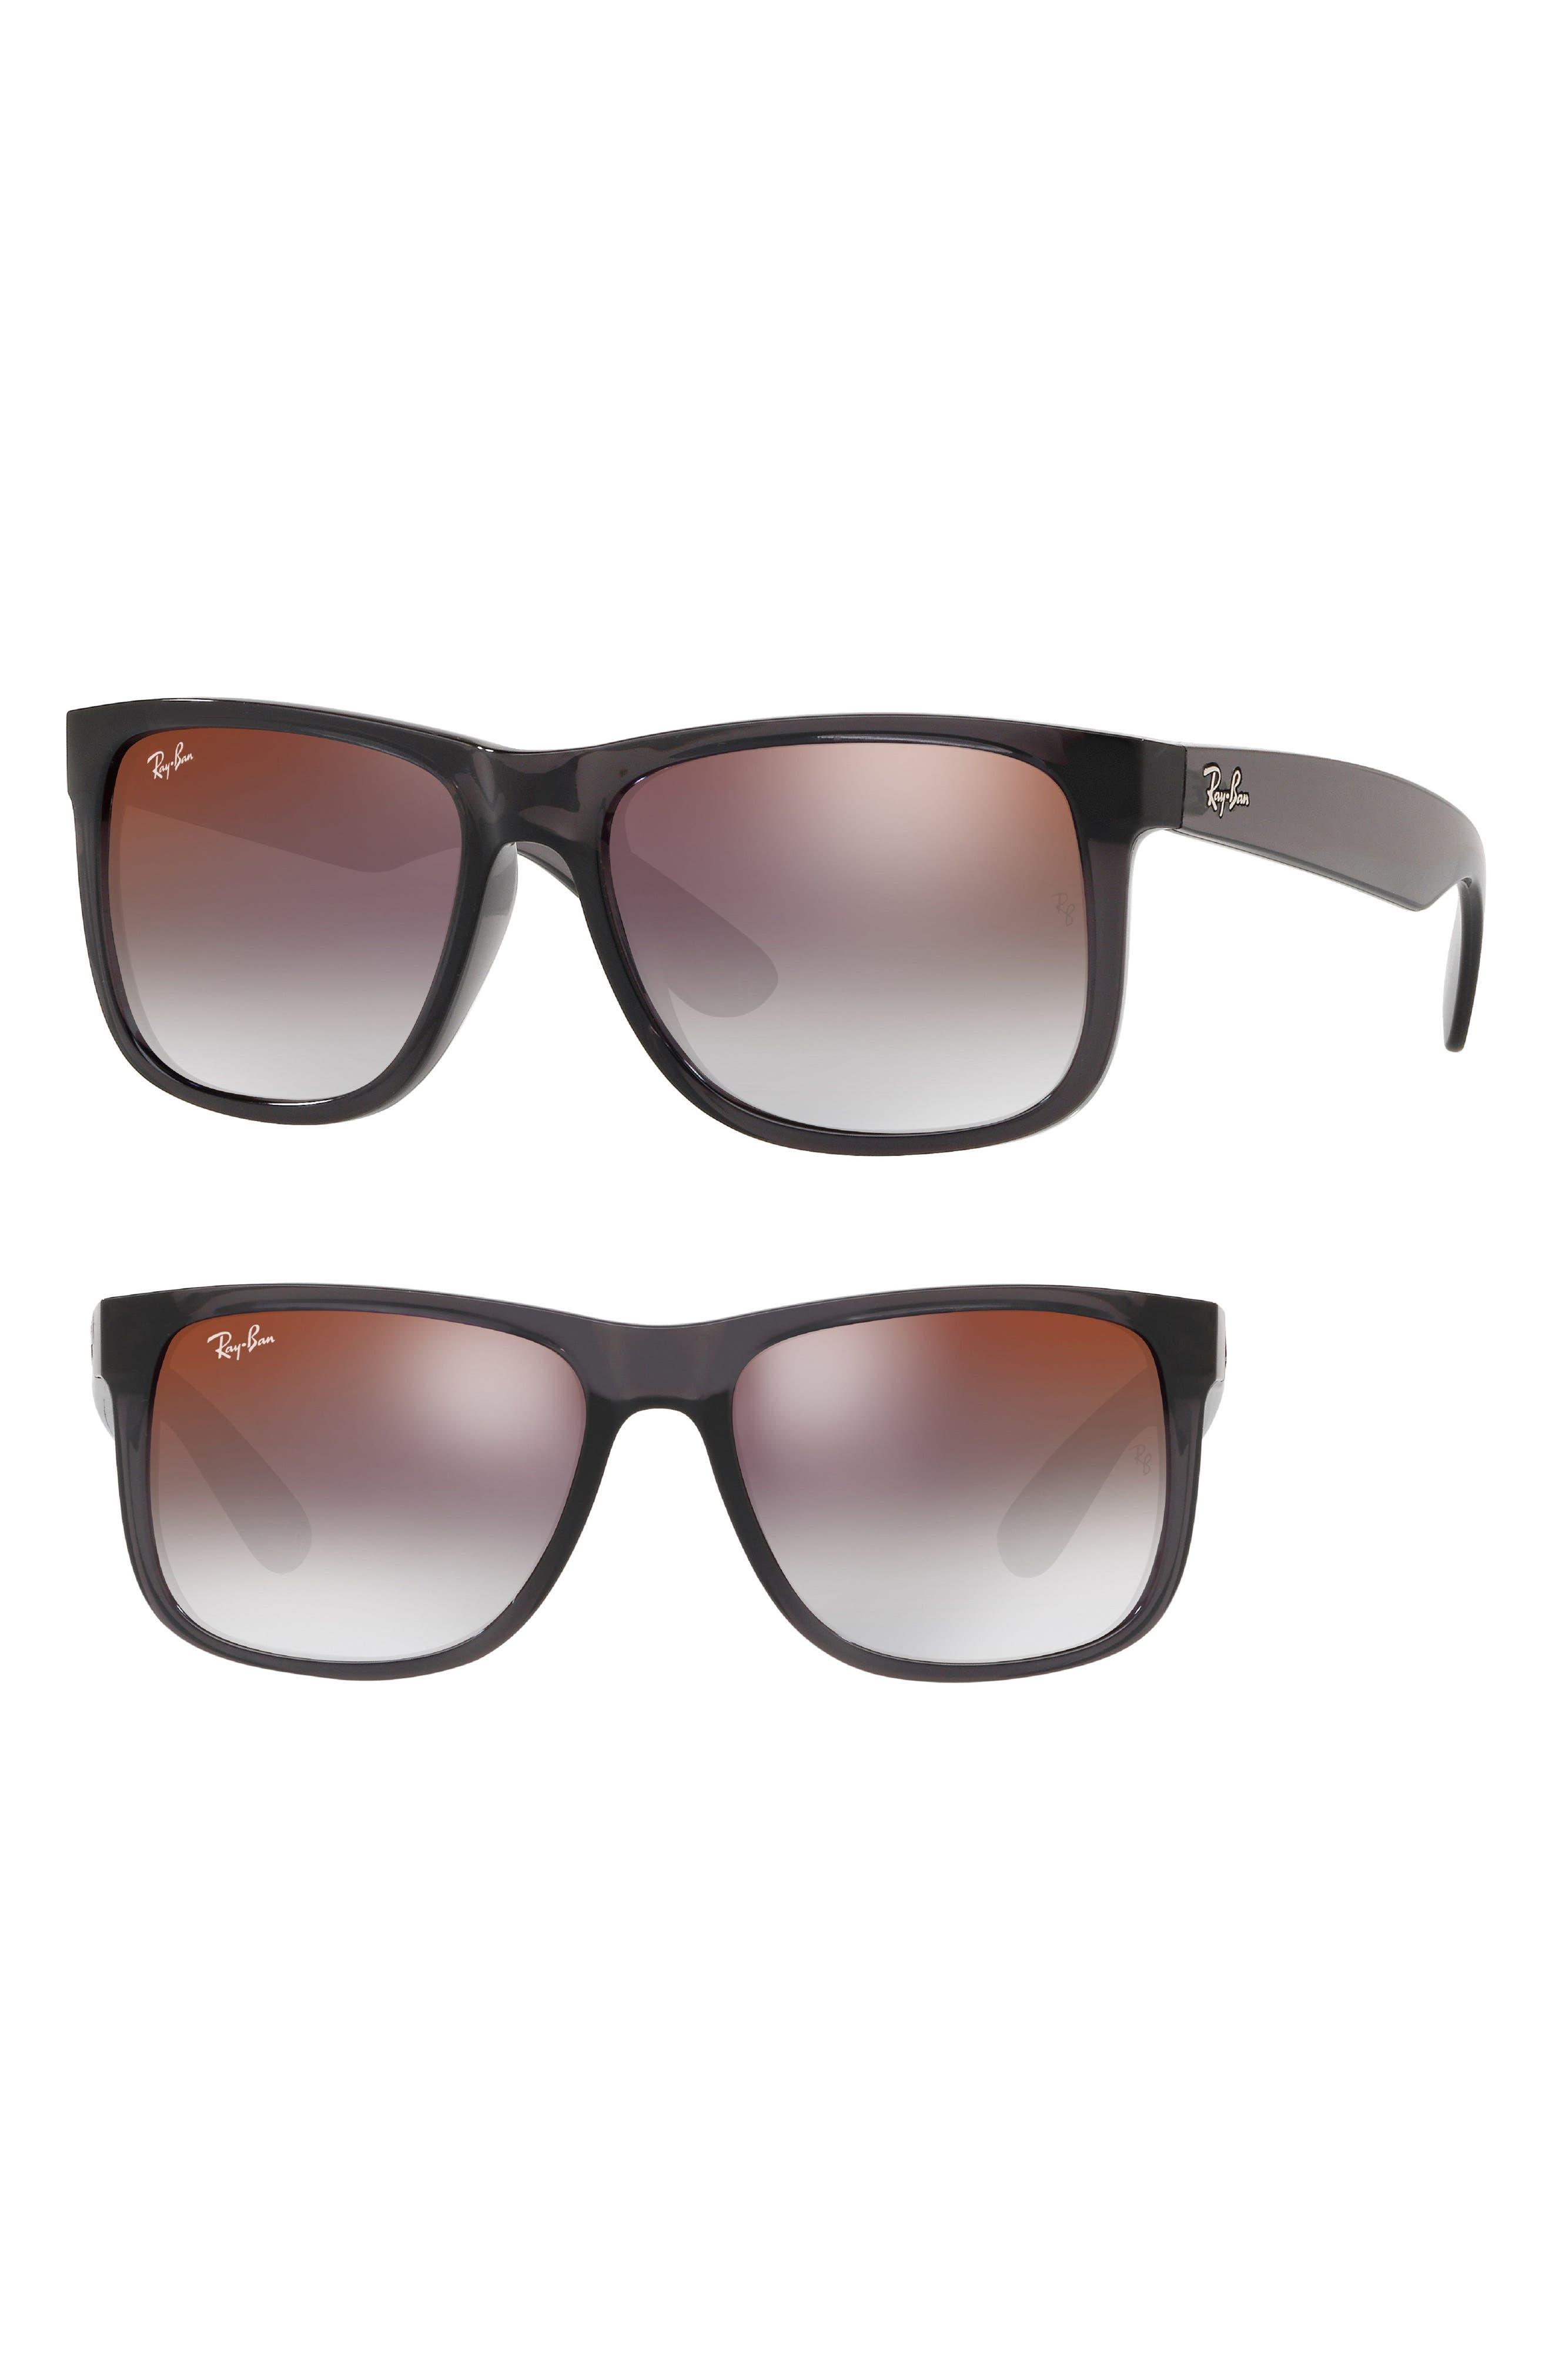 Ray-Ban 5m Sunglasses - Transparent